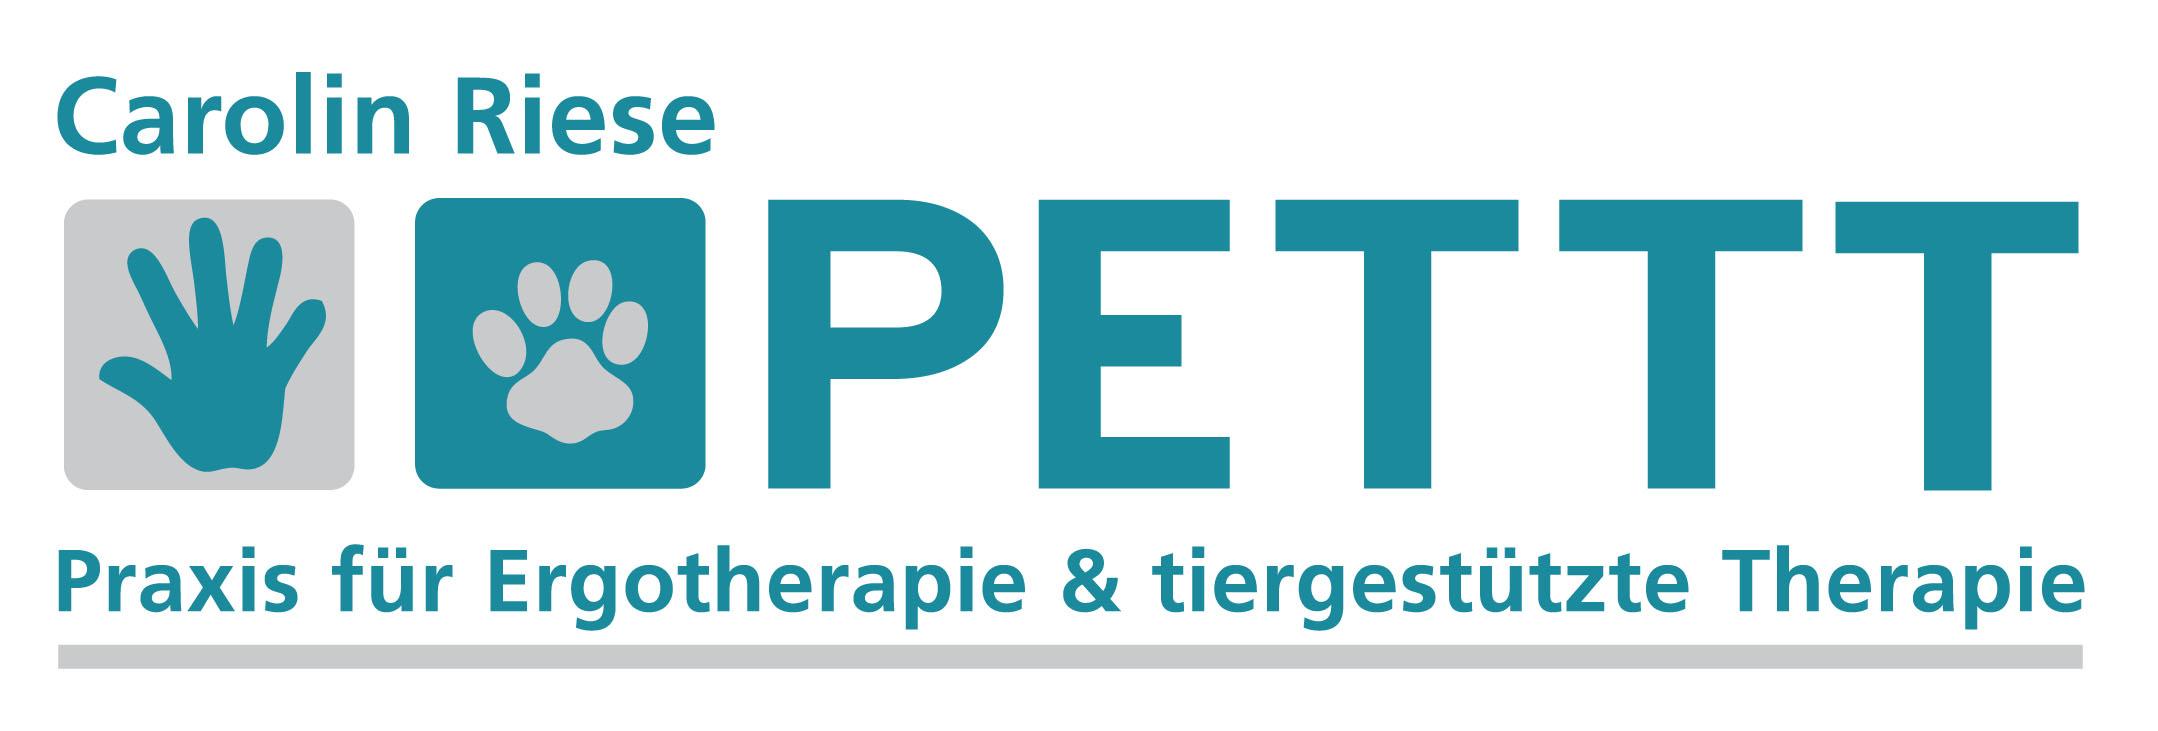 Ergotherapie PETTT Carolin Riese